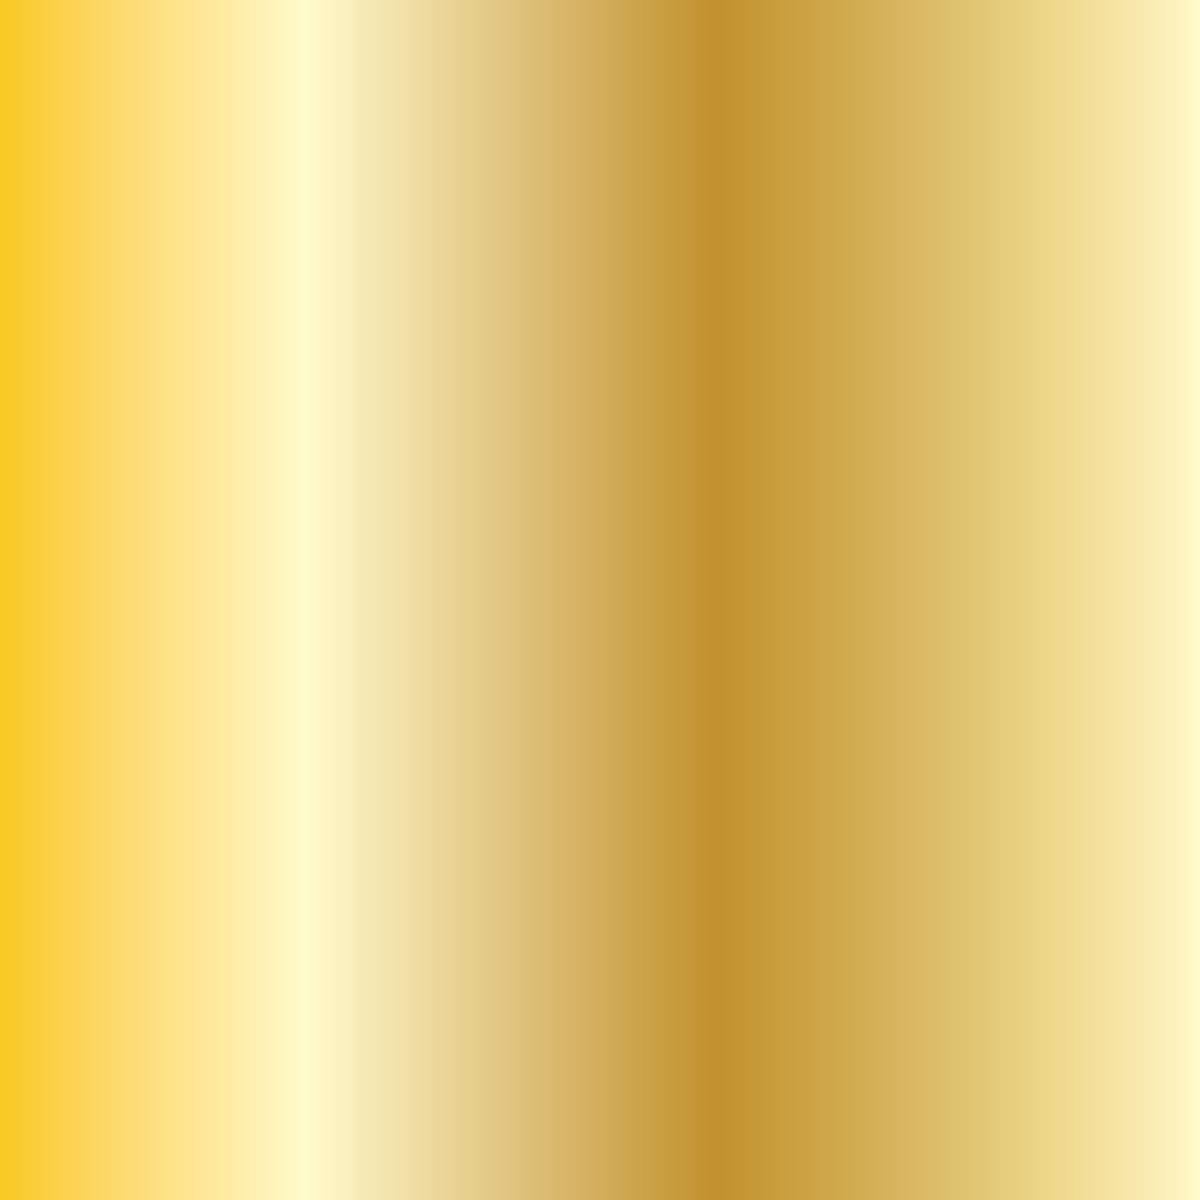 FolkArt ® Brushed Metal™ Acrylic Paint - Gold, 2 oz.